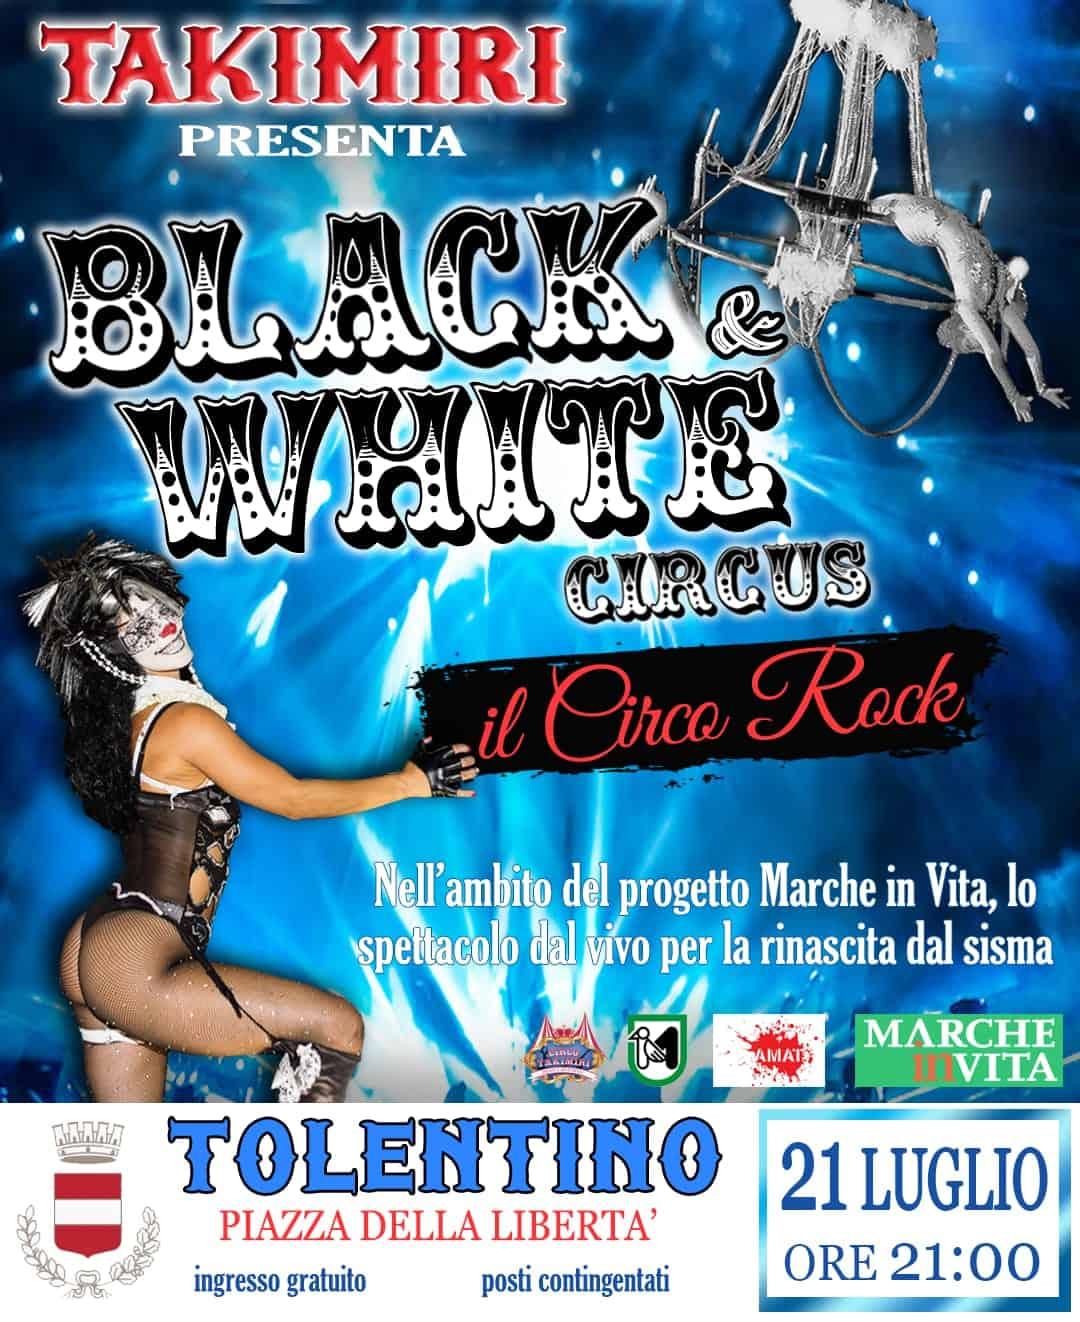 BLACK & WHITE CIRCUS - il Circo Rock